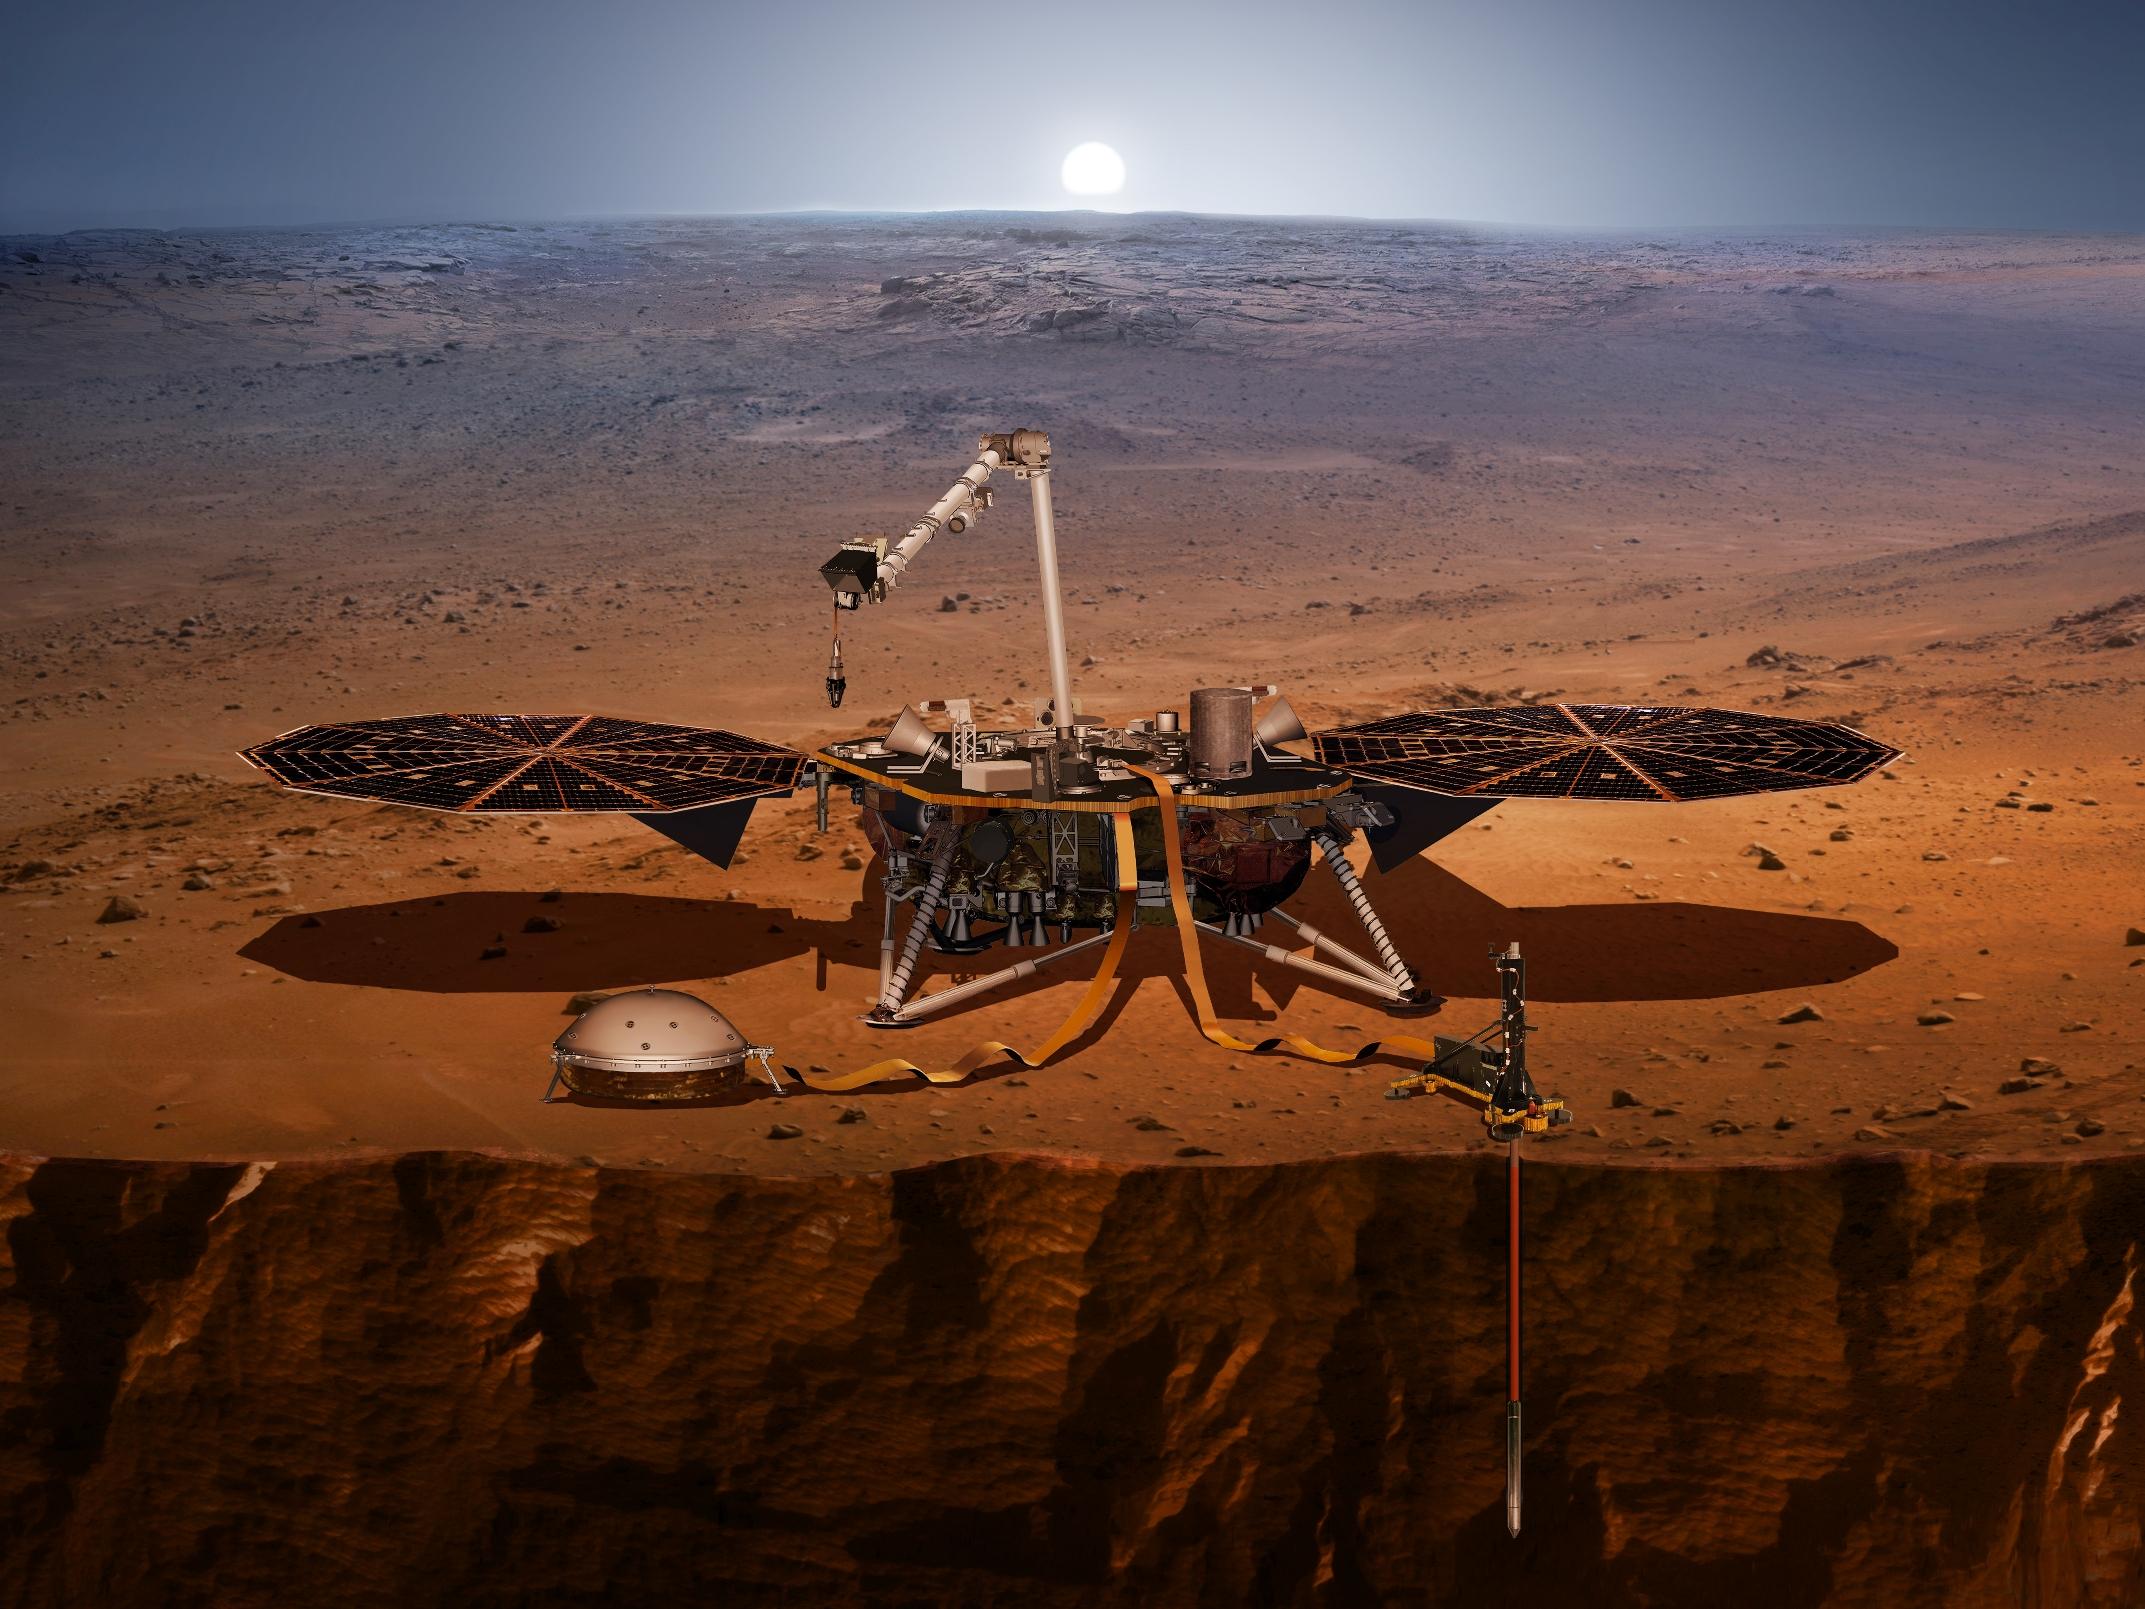 InSight lander on the surface of Mars